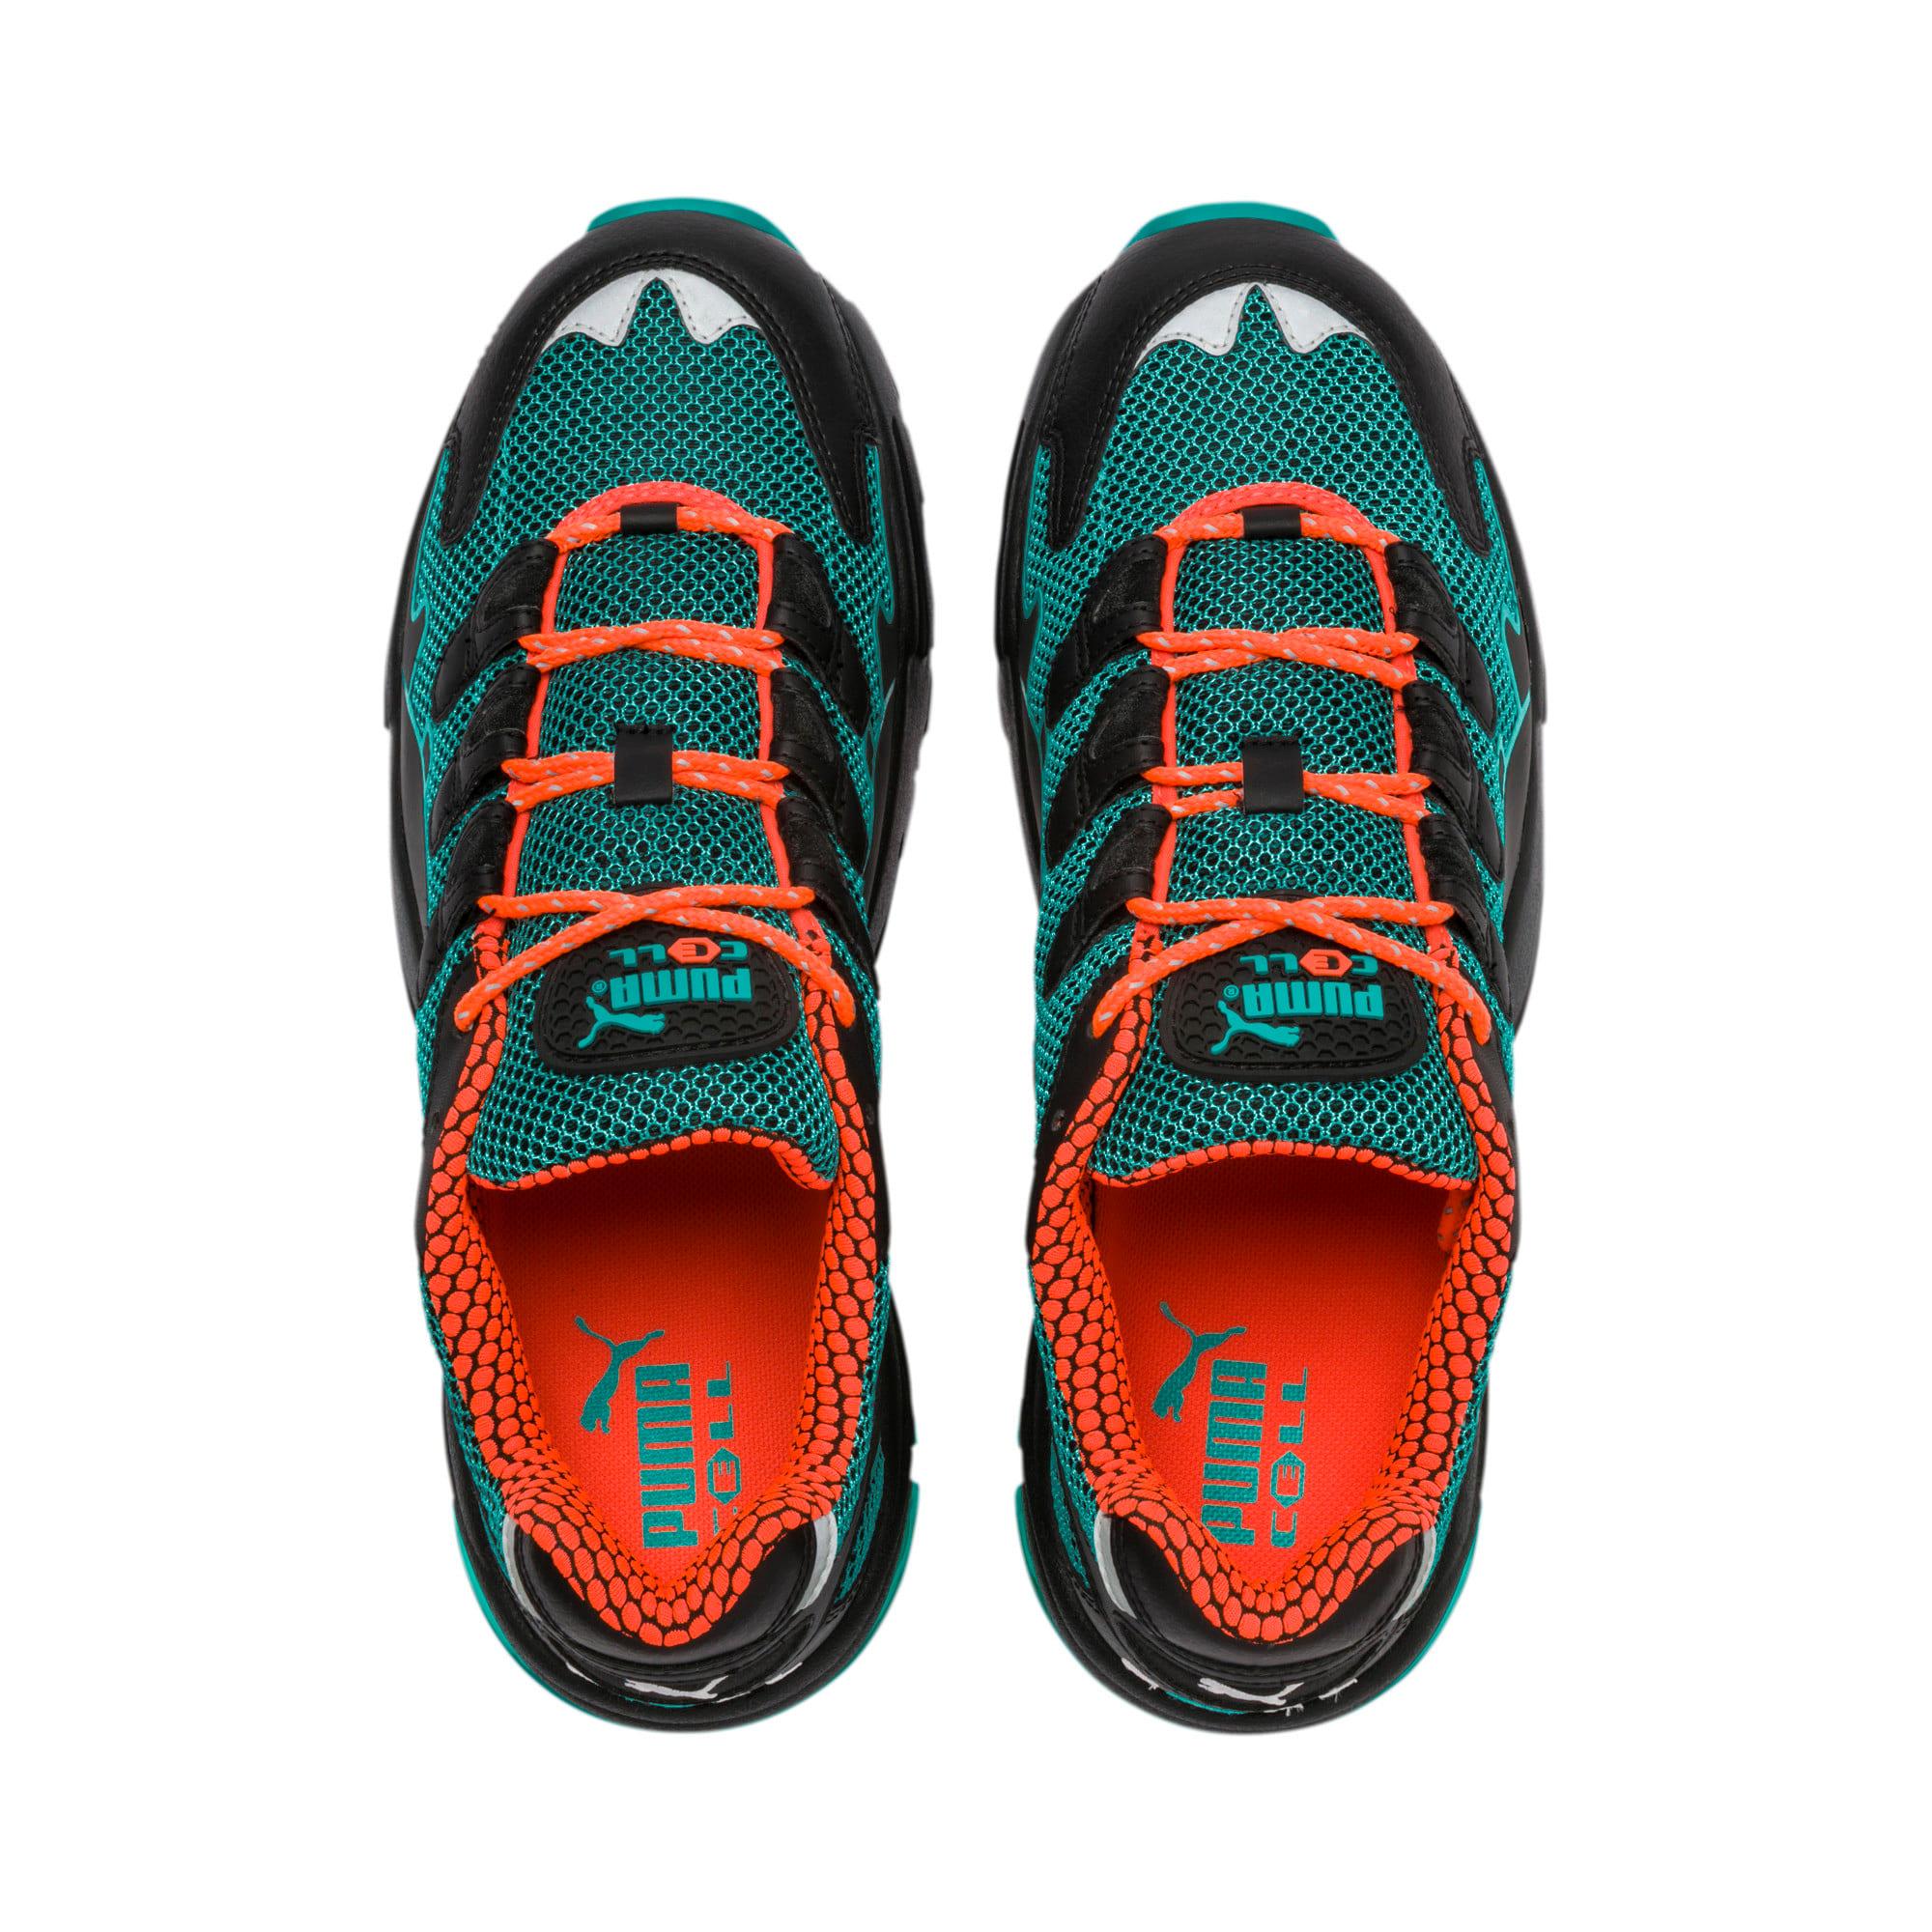 Thumbnail 7 of CELL Alien Kotto Sneakers, Puma Black-Blue Turquoise, medium